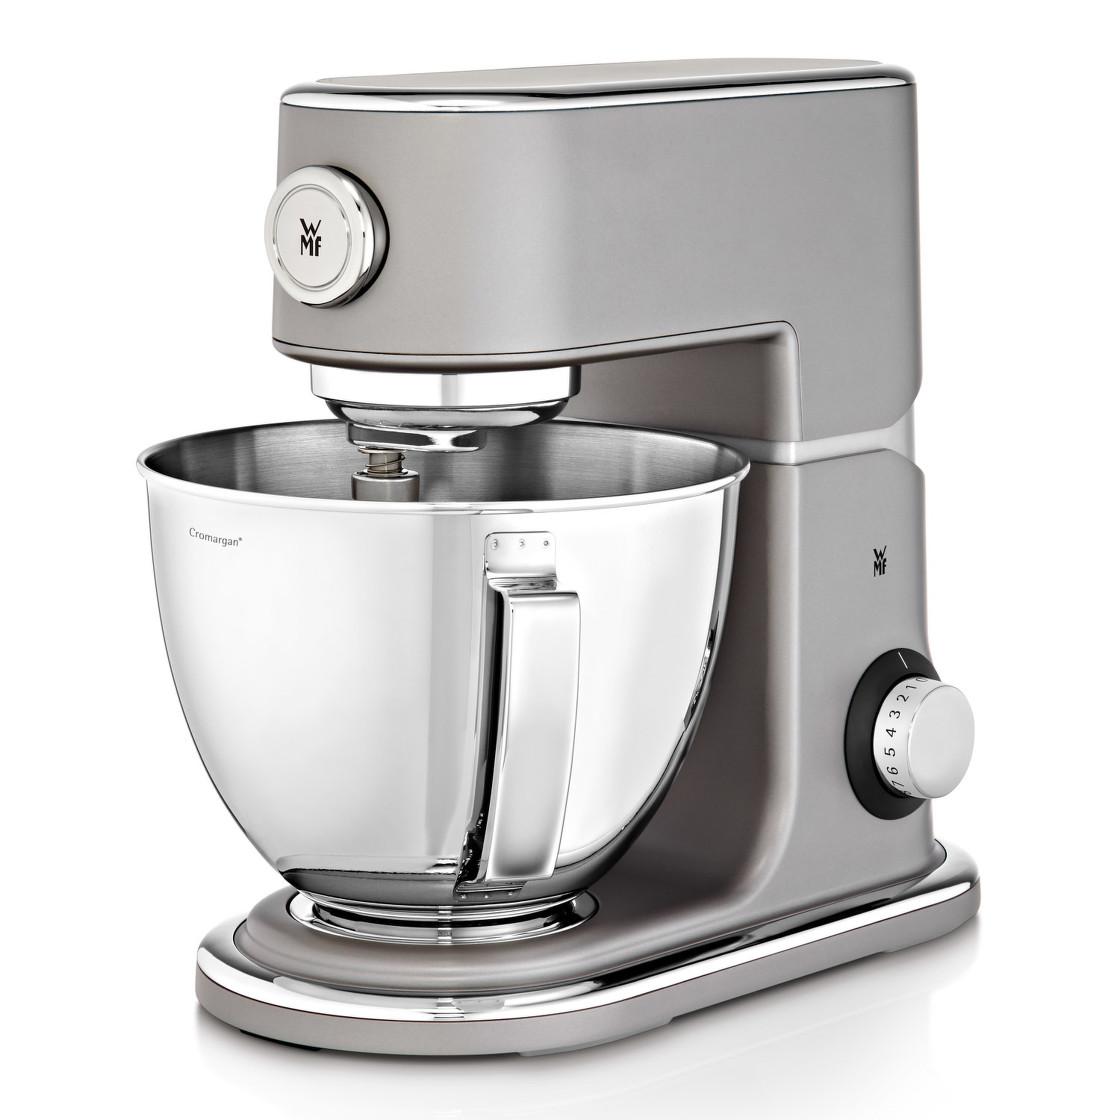 Kuchynský robot Profi Plus steel grey WMF